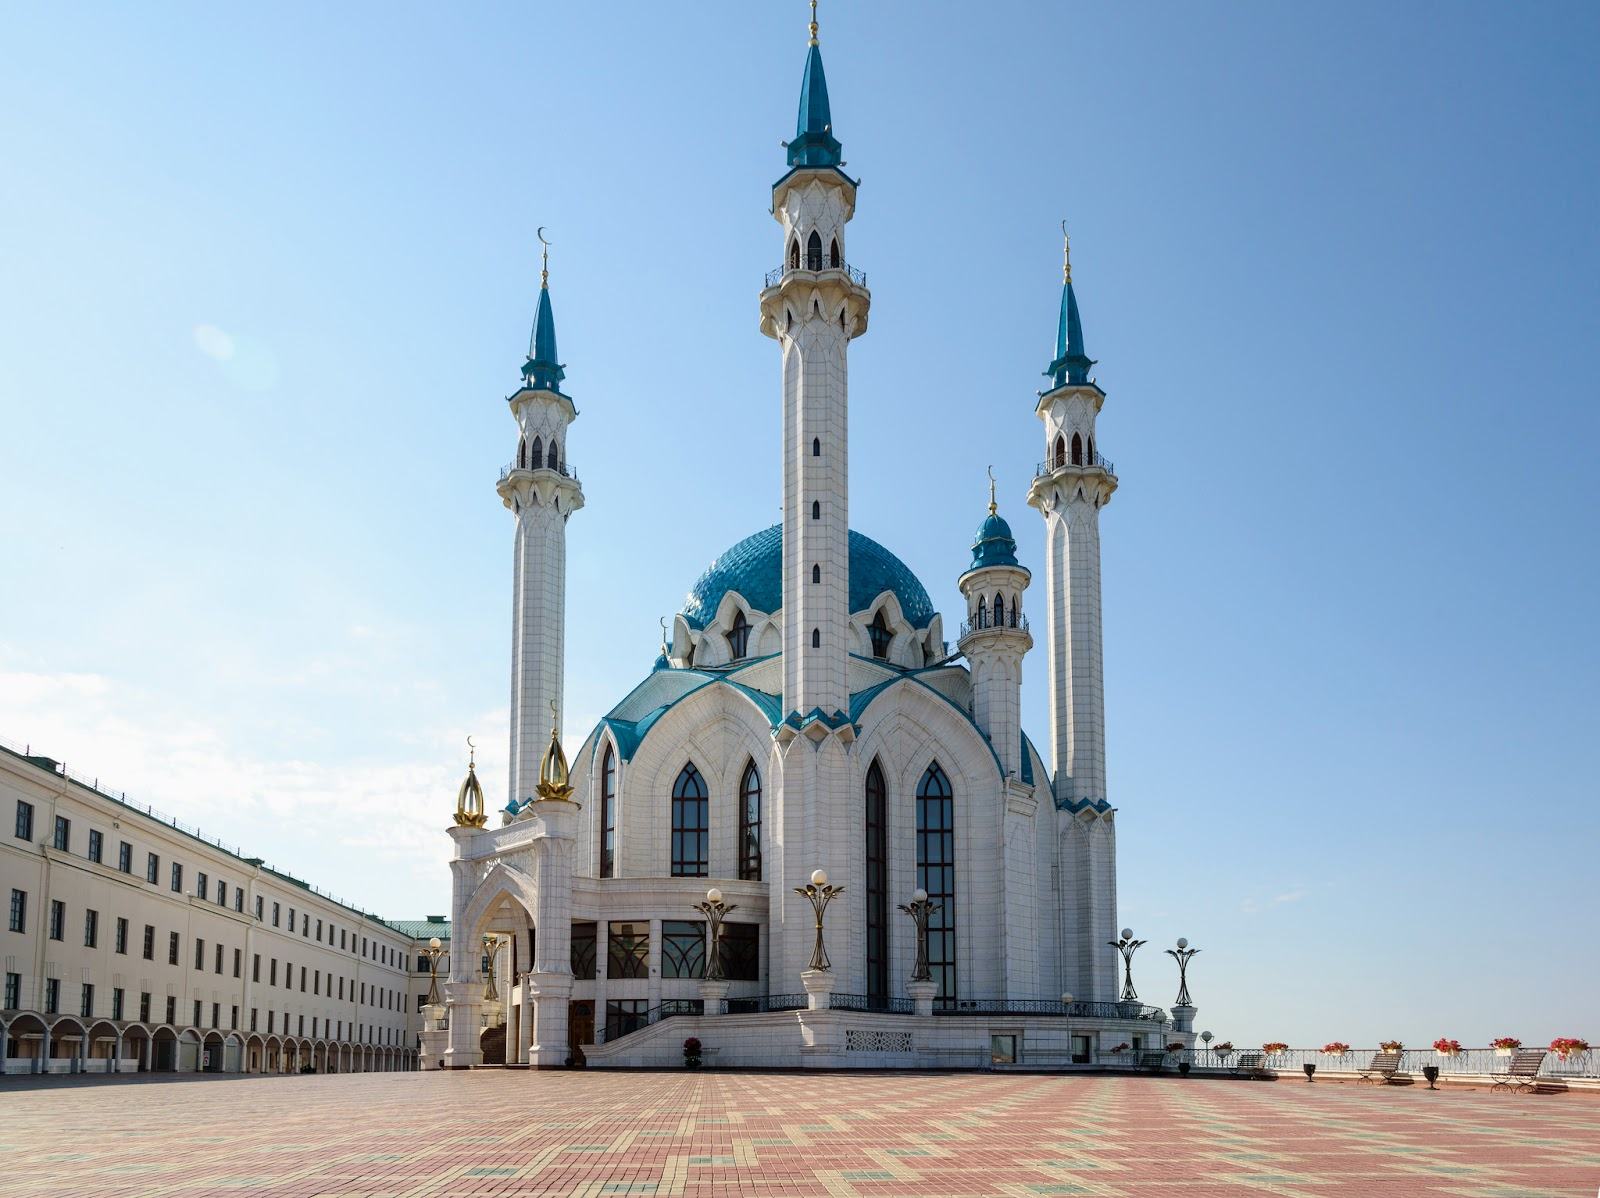 Мечеть Кул-Шариф. Фотография